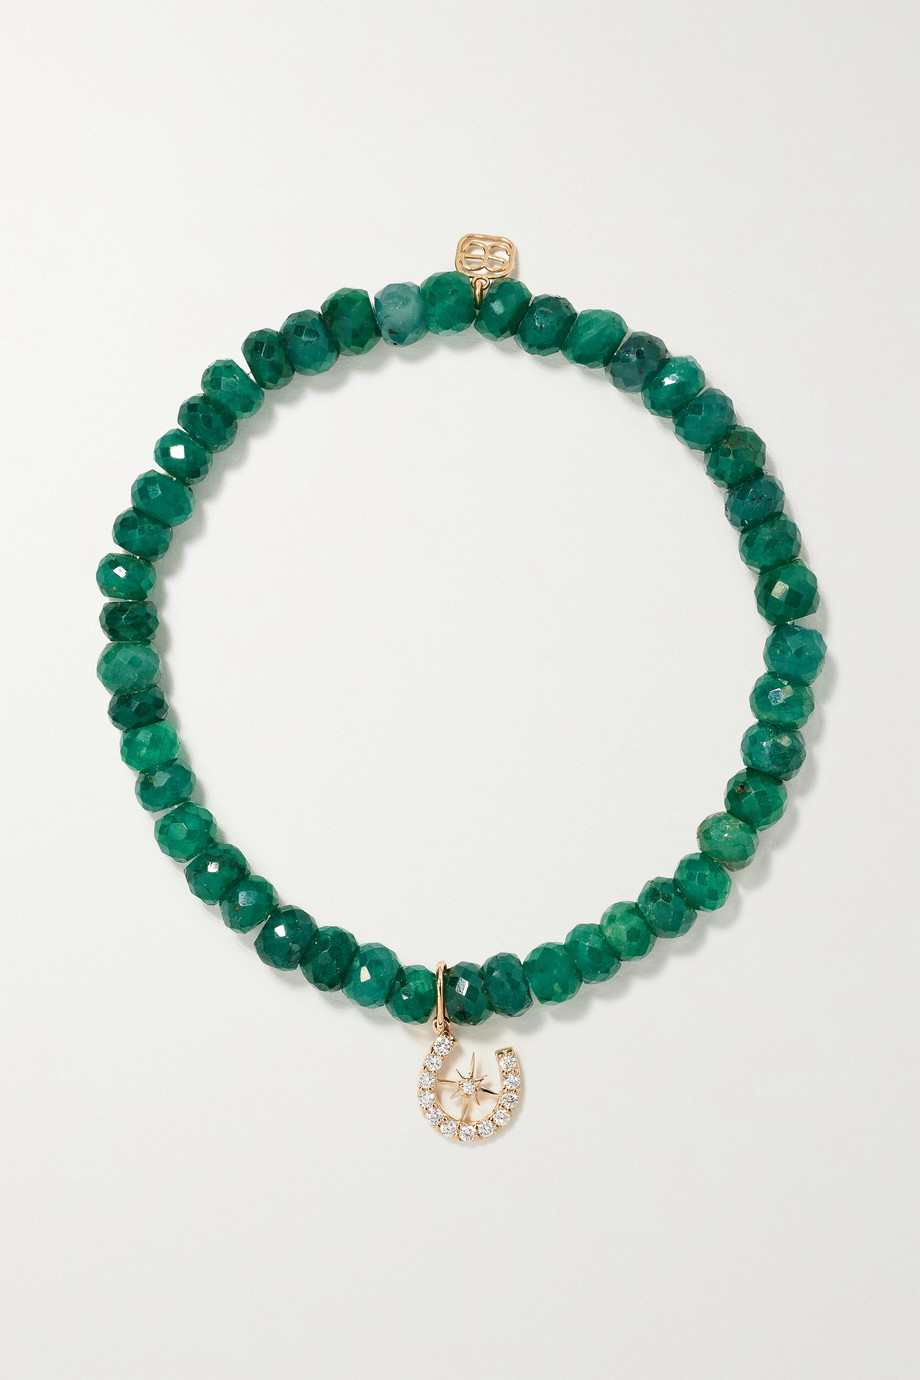 Sydney Evan Starburst Horseshoe 14-karat gold, corundum and diamond bracelet